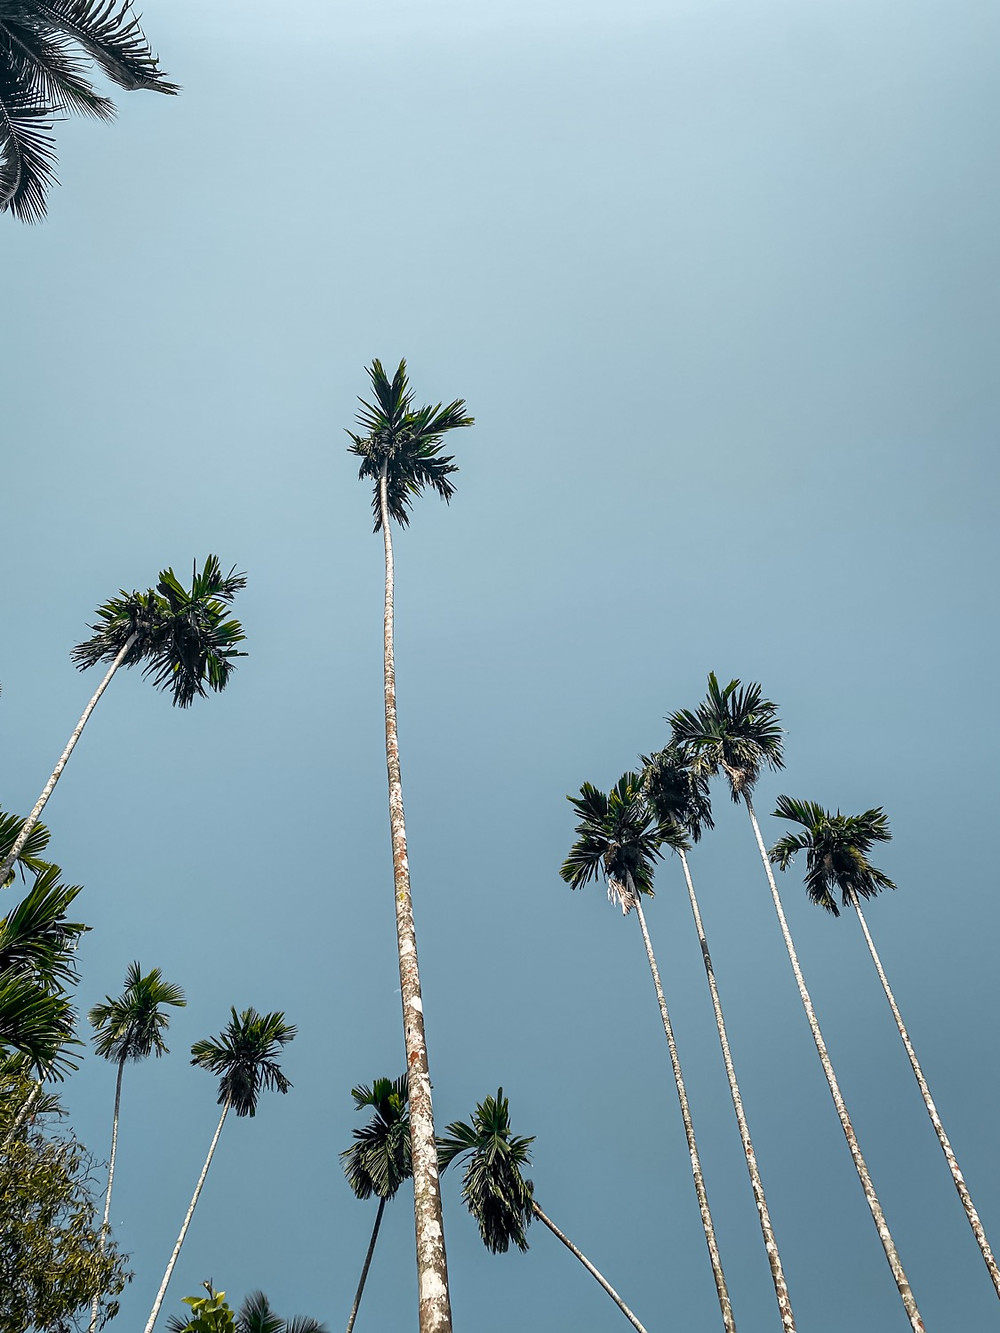 Tall palm trees, Sky, Tropical